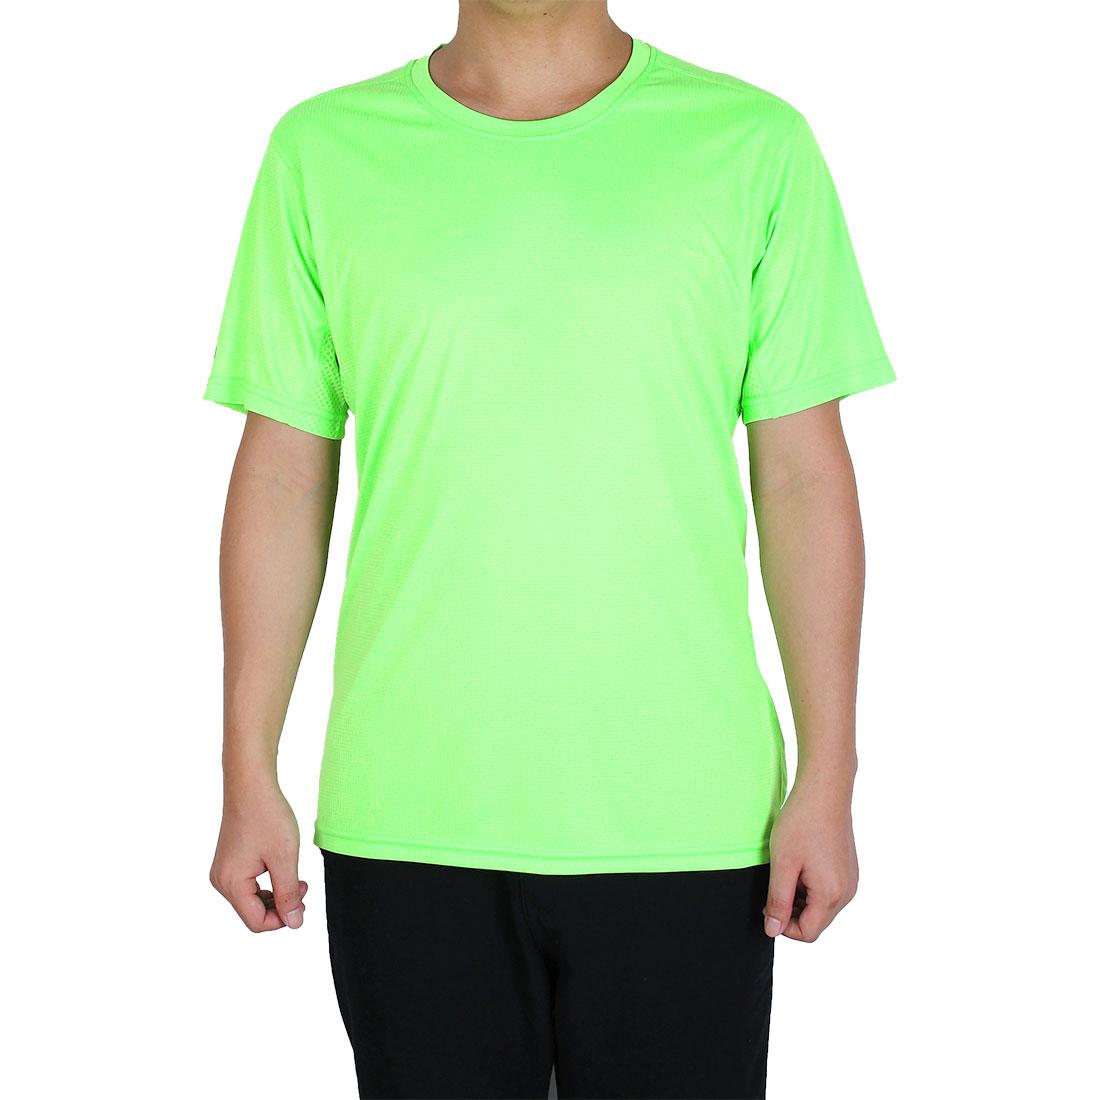 Men Breathable Short Sleeve Clothes Casual Tee Golf Tennis Sport T-shirt Green L